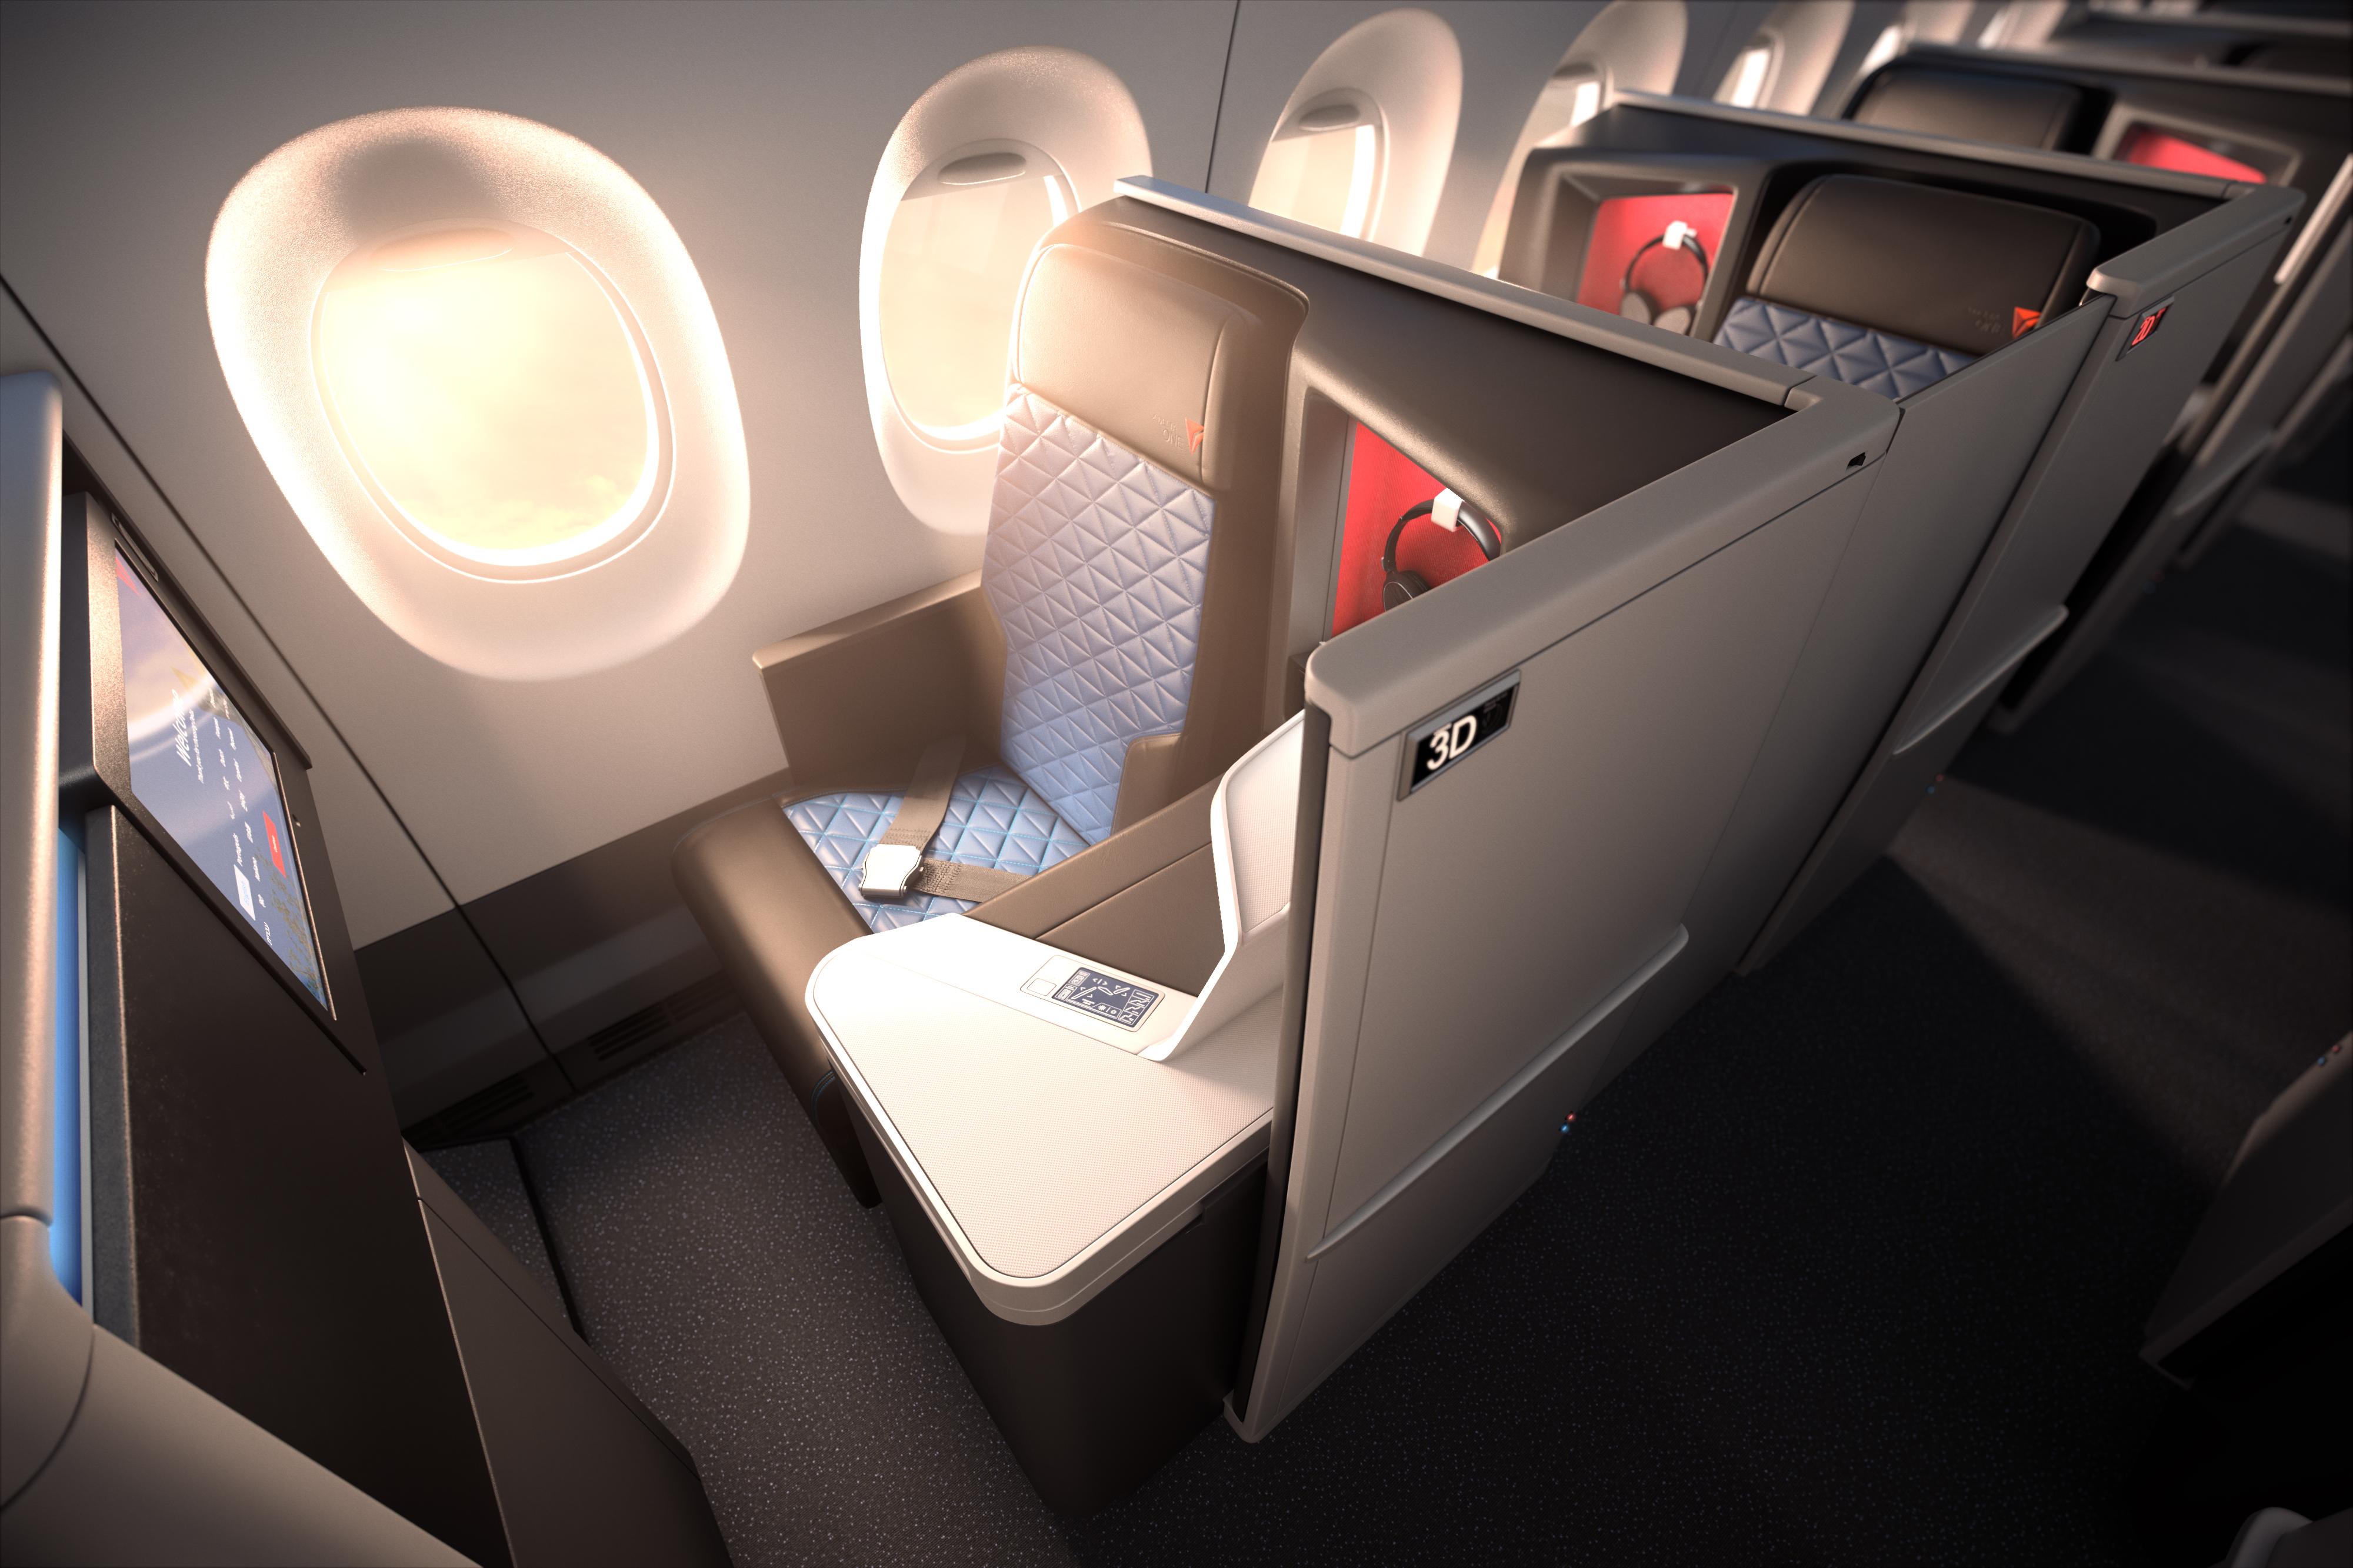 Delta air lines new business class suites soar to victory the delta air lines new business class suites soar to victory the motley fool colourmoves